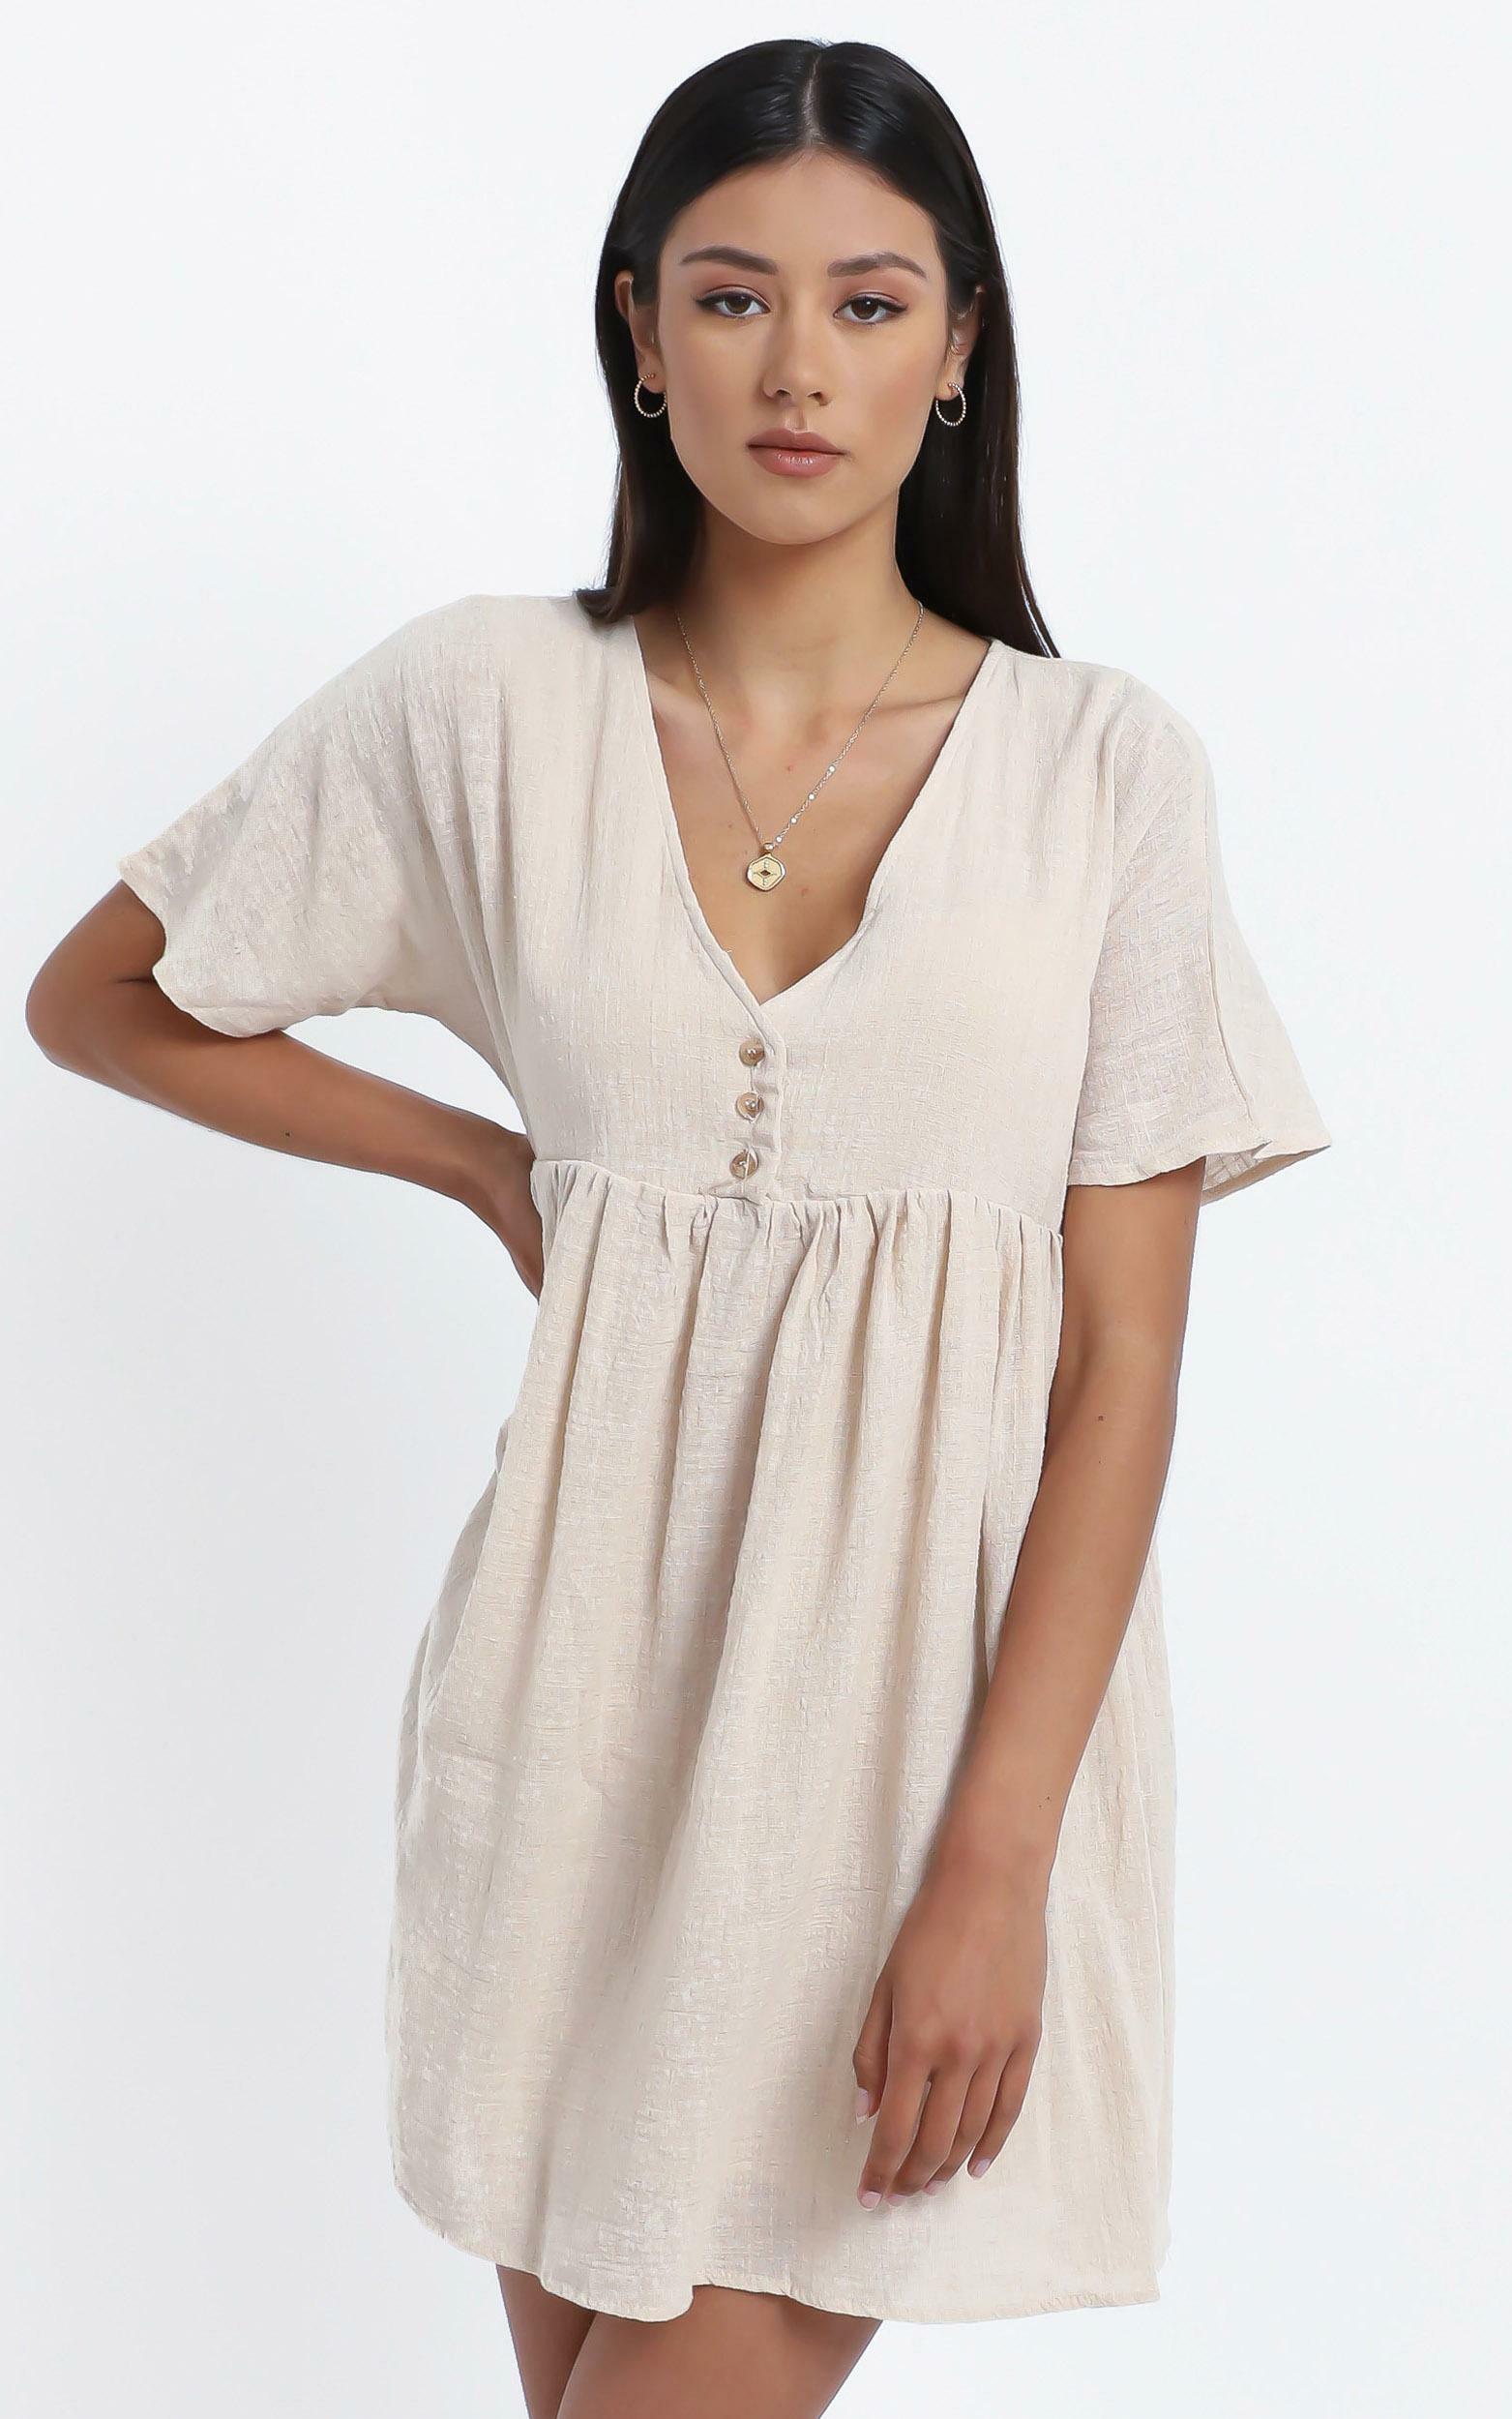 Coraline Dress in Beige - 12 (L), Beige, hi-res image number null